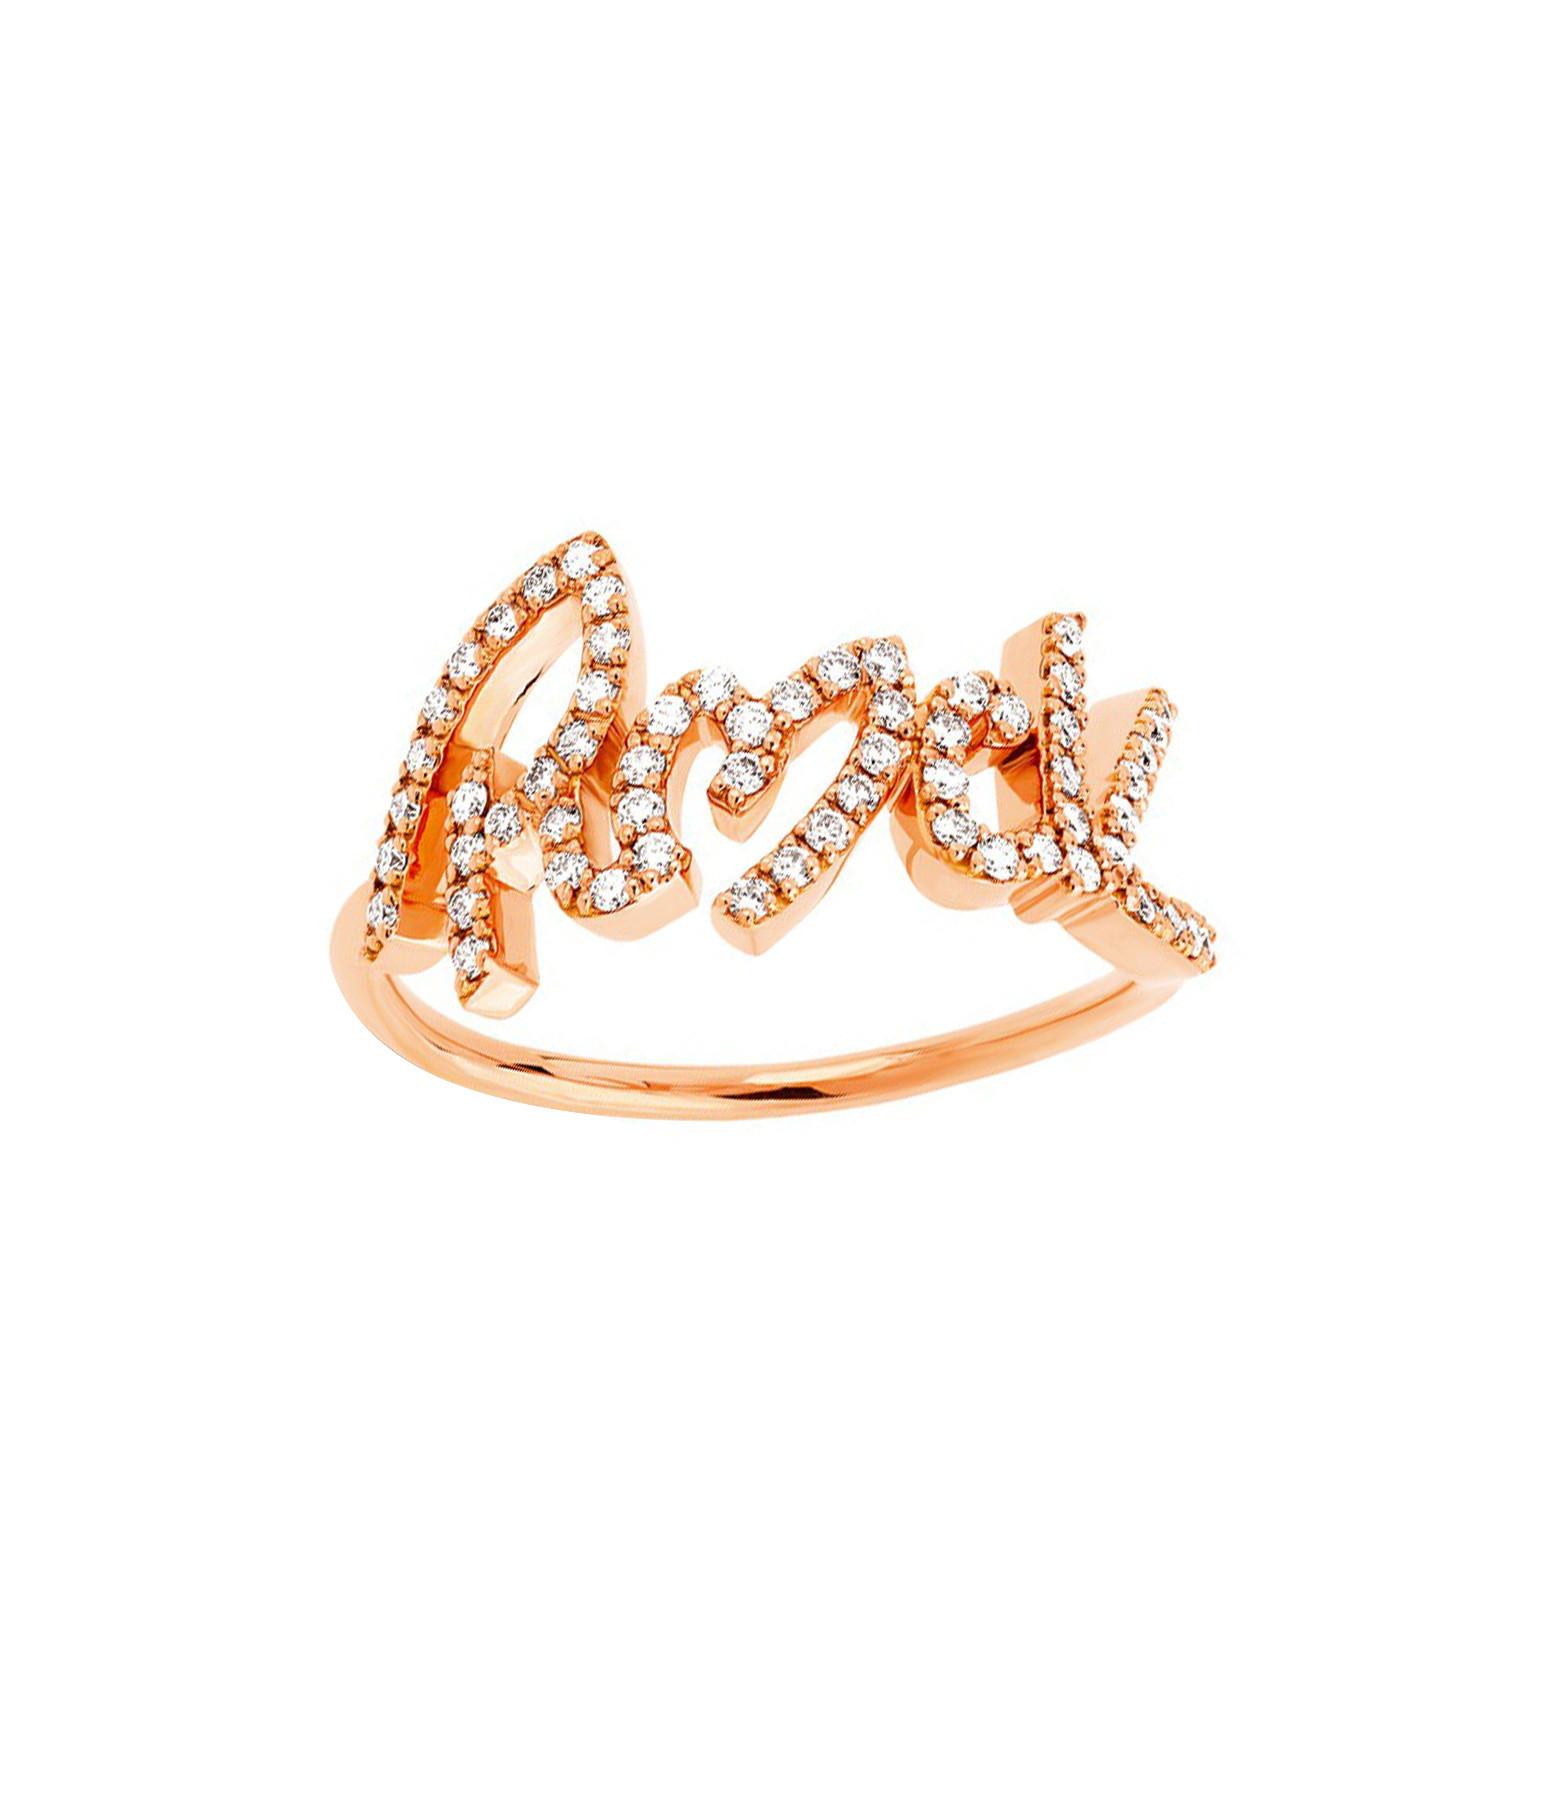 NAVA JOAILLERIE - Bague Rock Diamants Or Rose